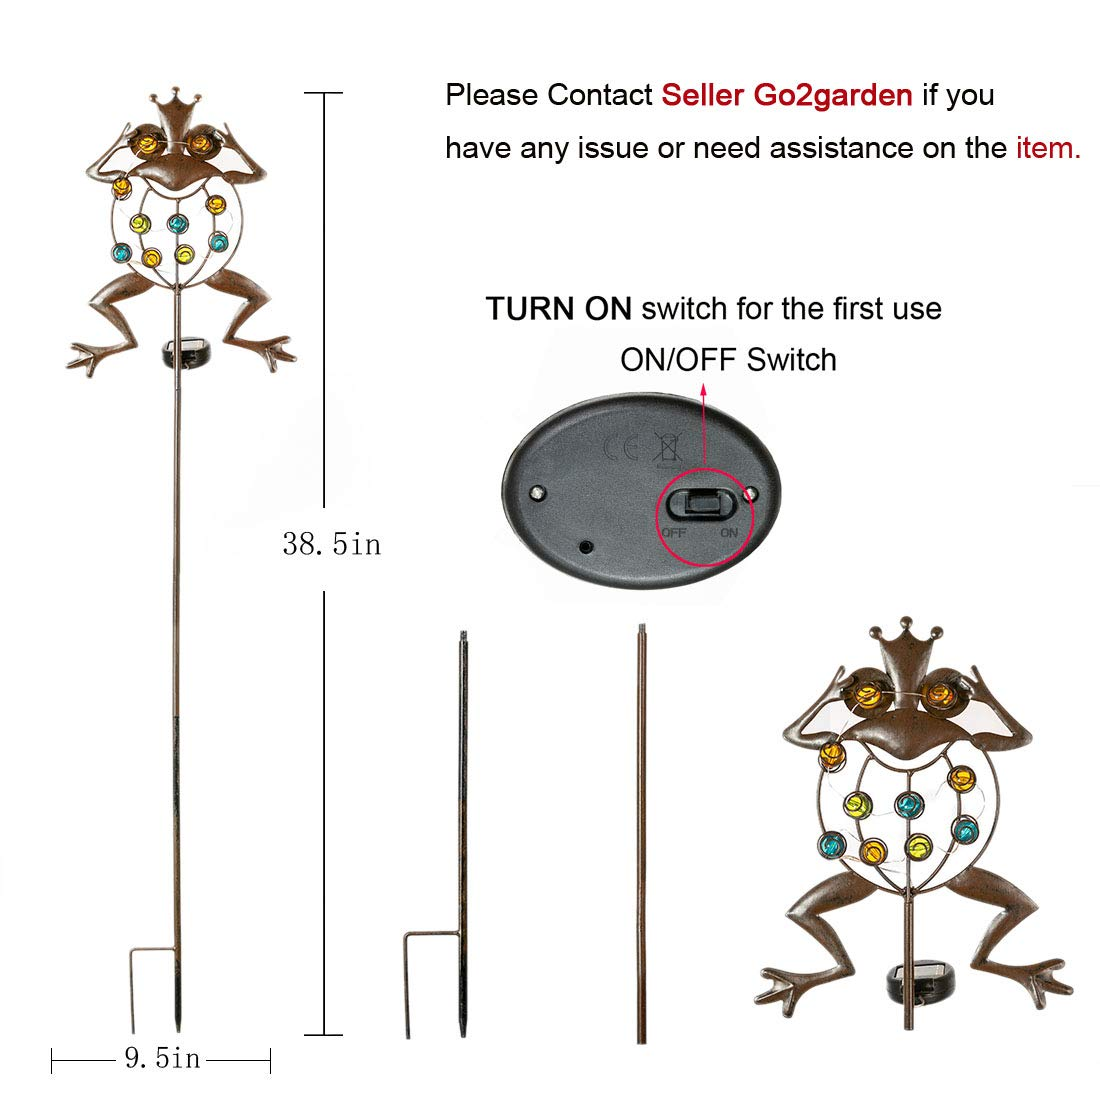 Go2garden Solar Garden Lights, Stake Light Metal Frog Outdoor Decoration, LED Waterproof Landscape Lights for Yard, Lawn Decor (Rustic)